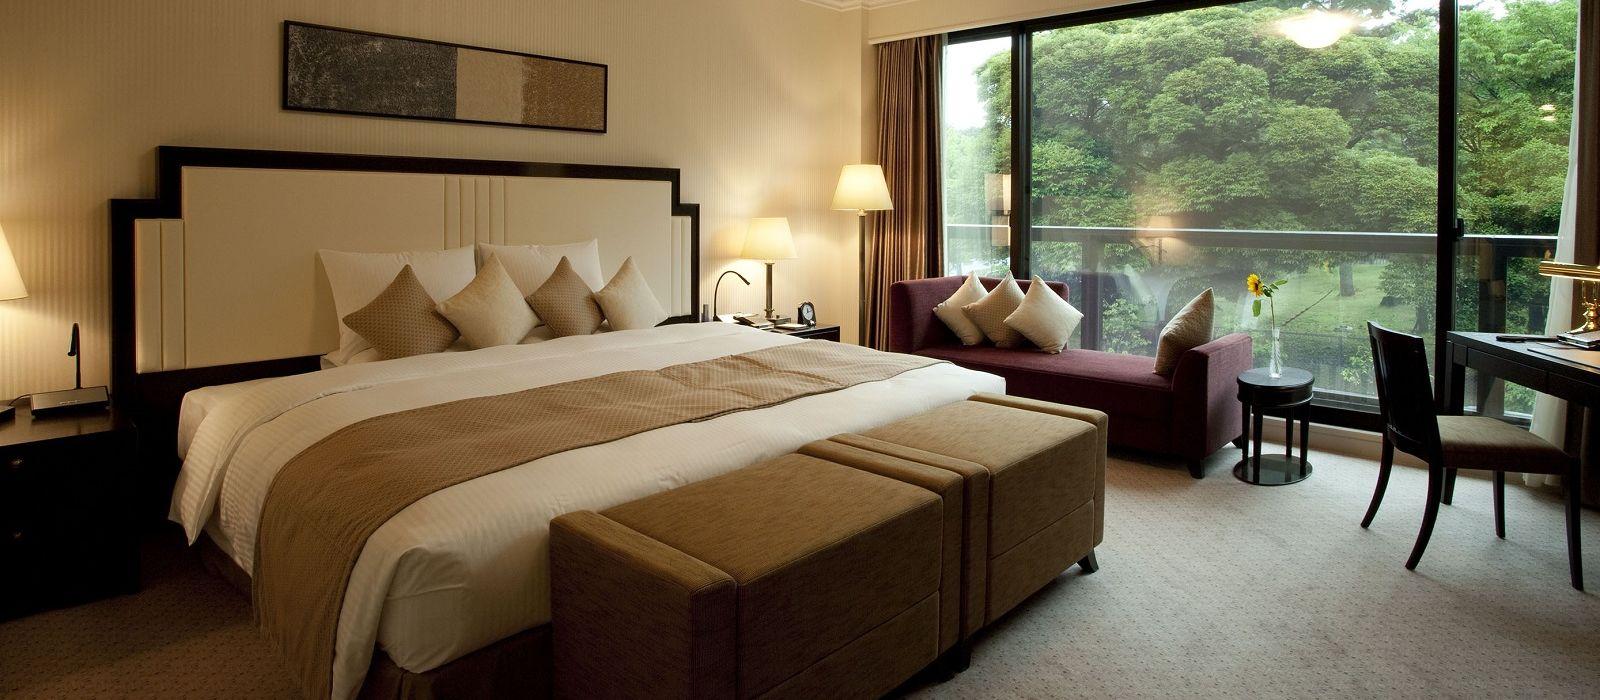 Hotel Noborioji  Nara Japan